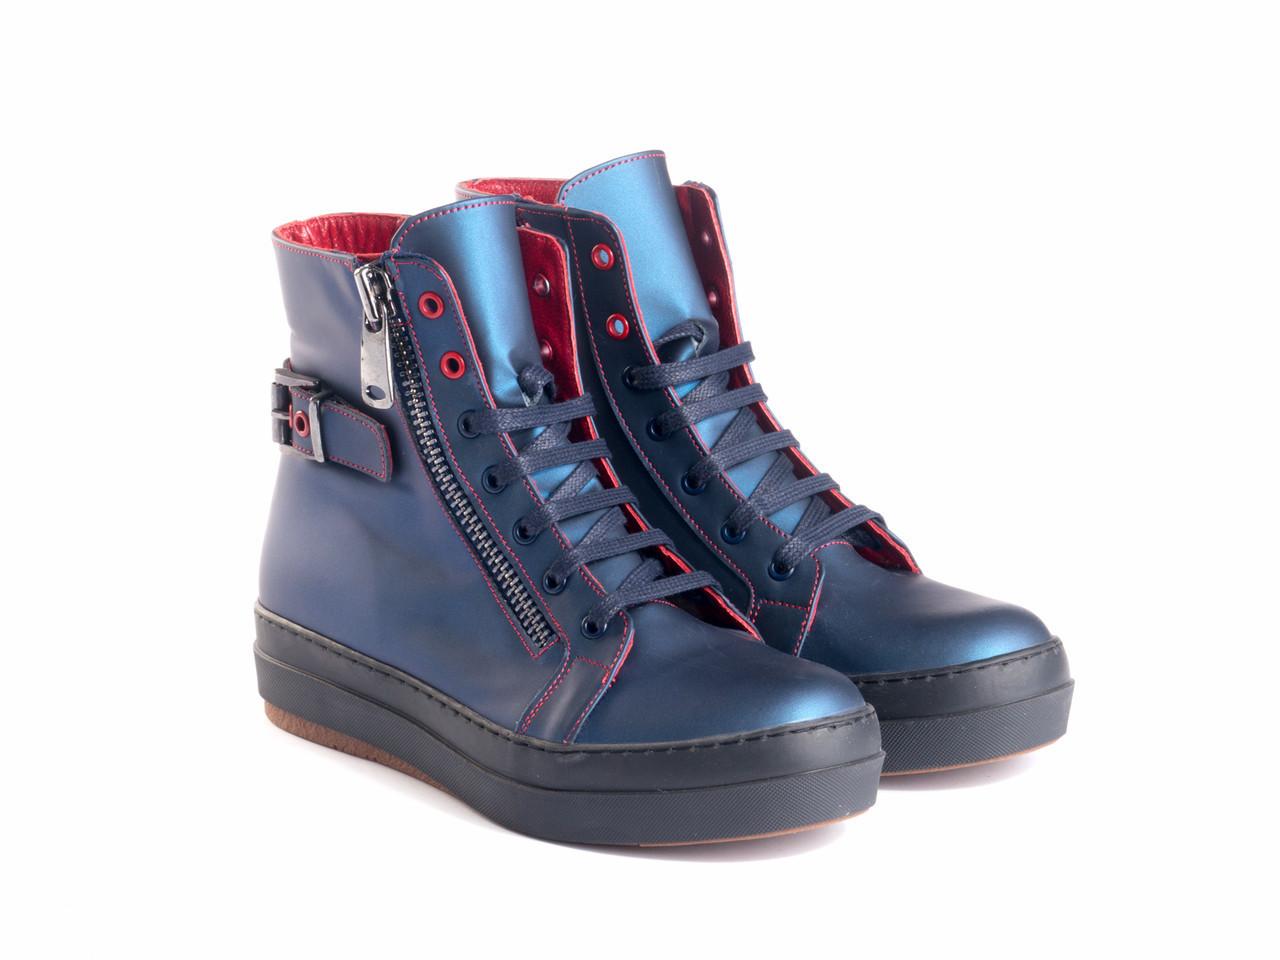 Ботинки Etor 4481-32-274-06 37 синие